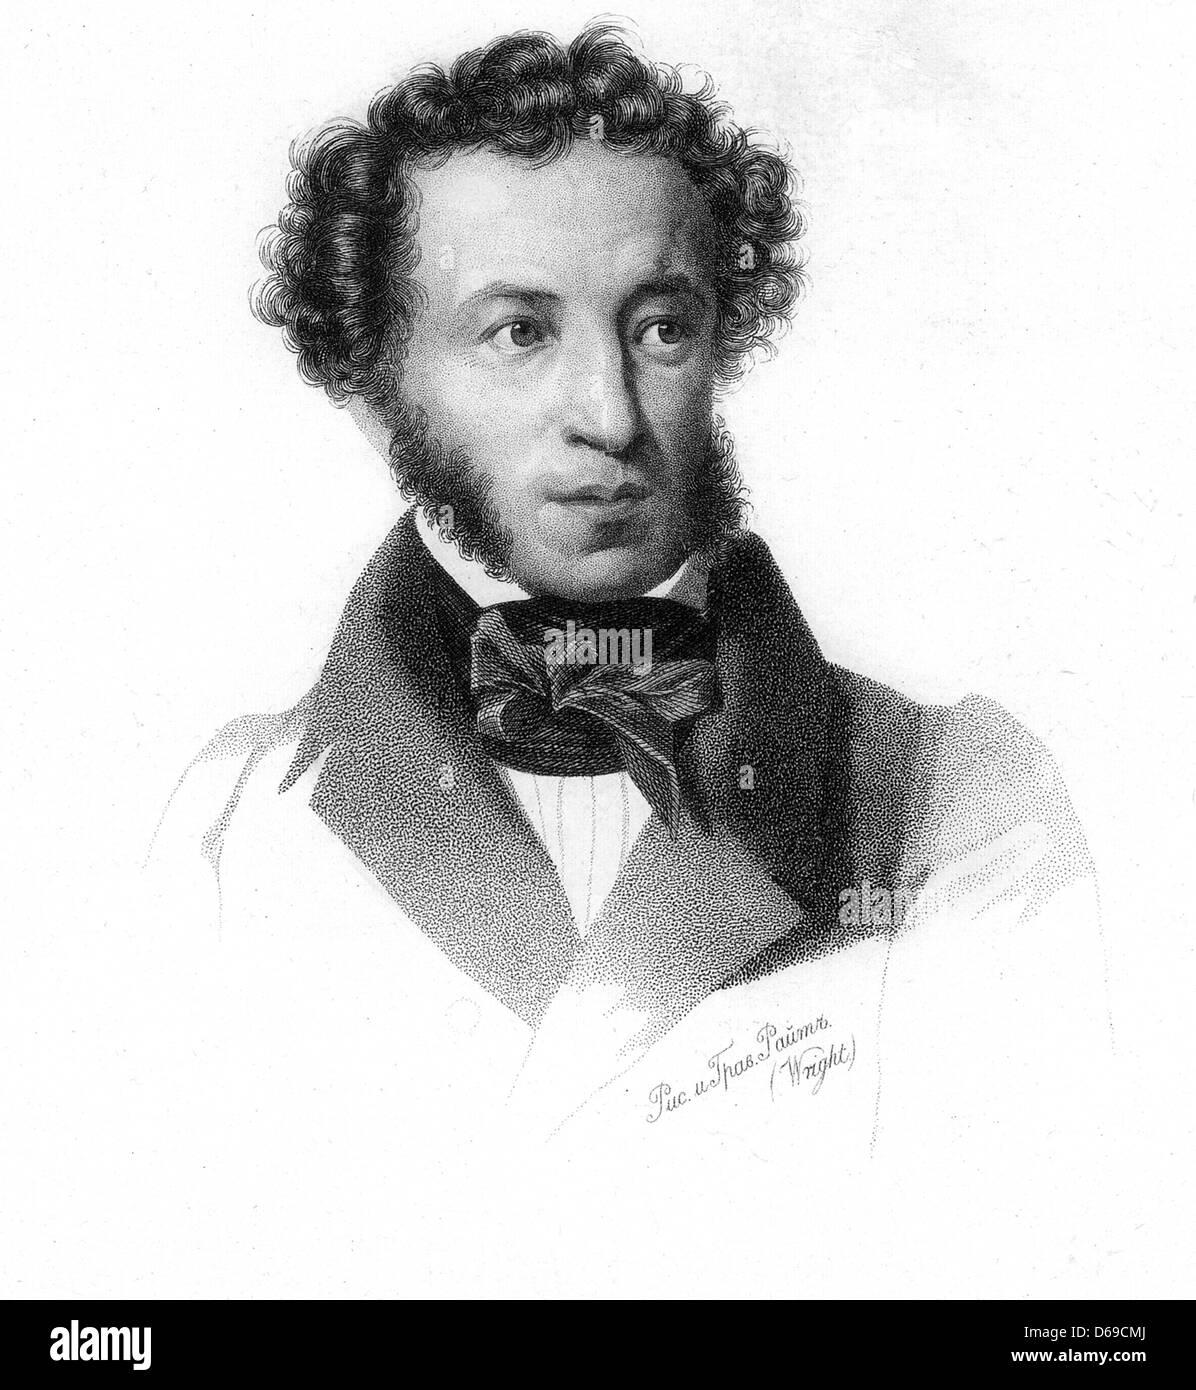 Did Alexander Pushkin write obscene poems? 86